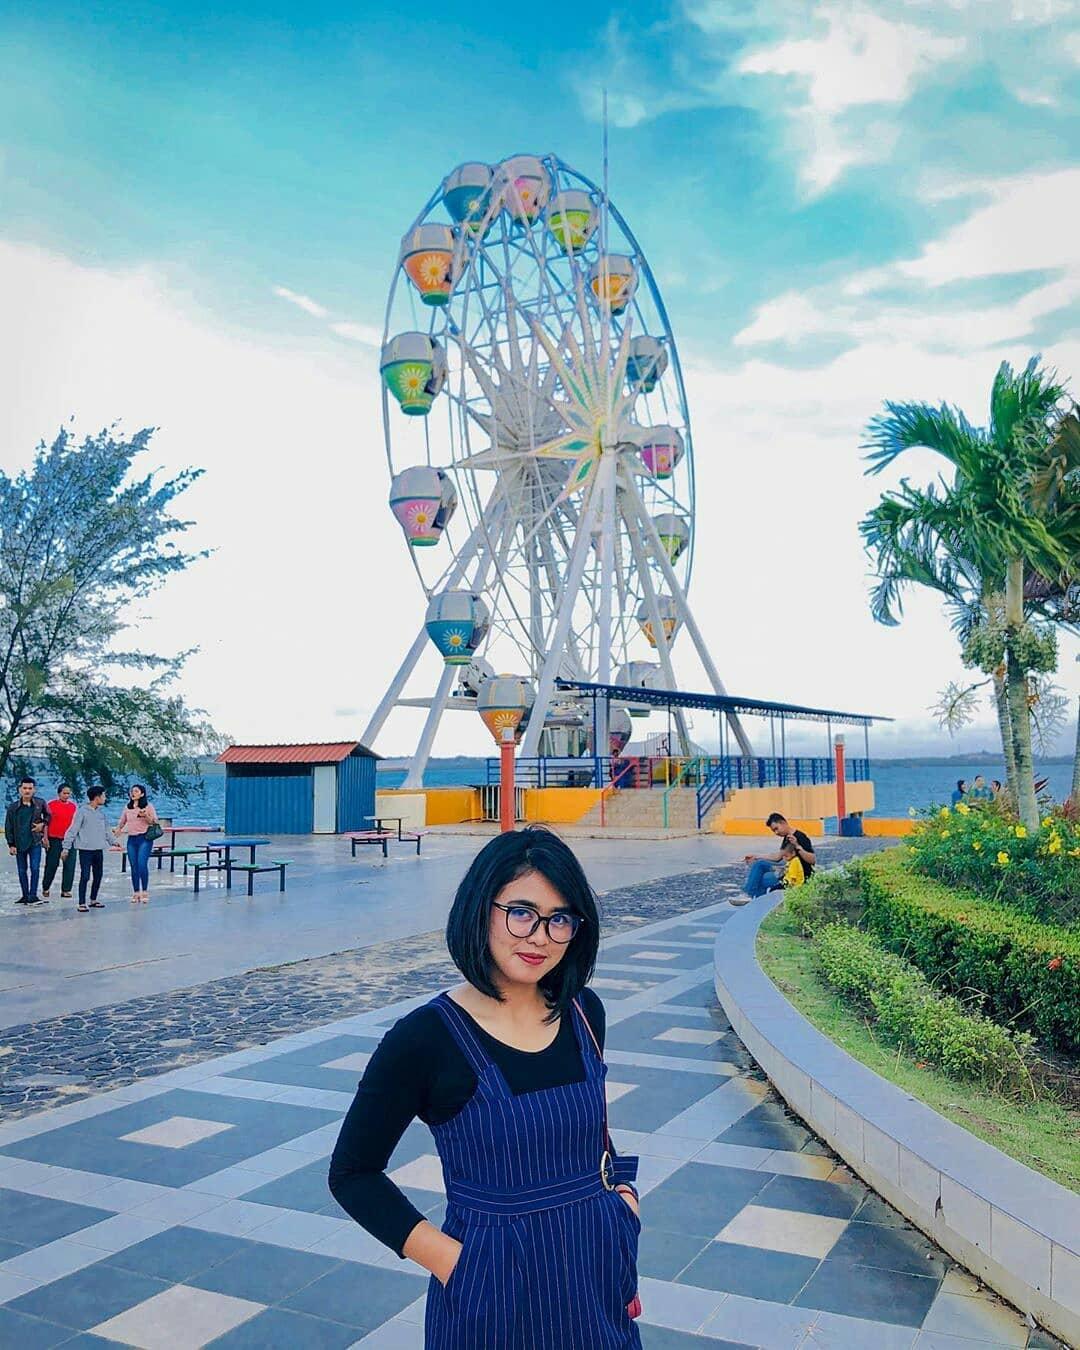 Bianglala Ocarina Batam Theme Park